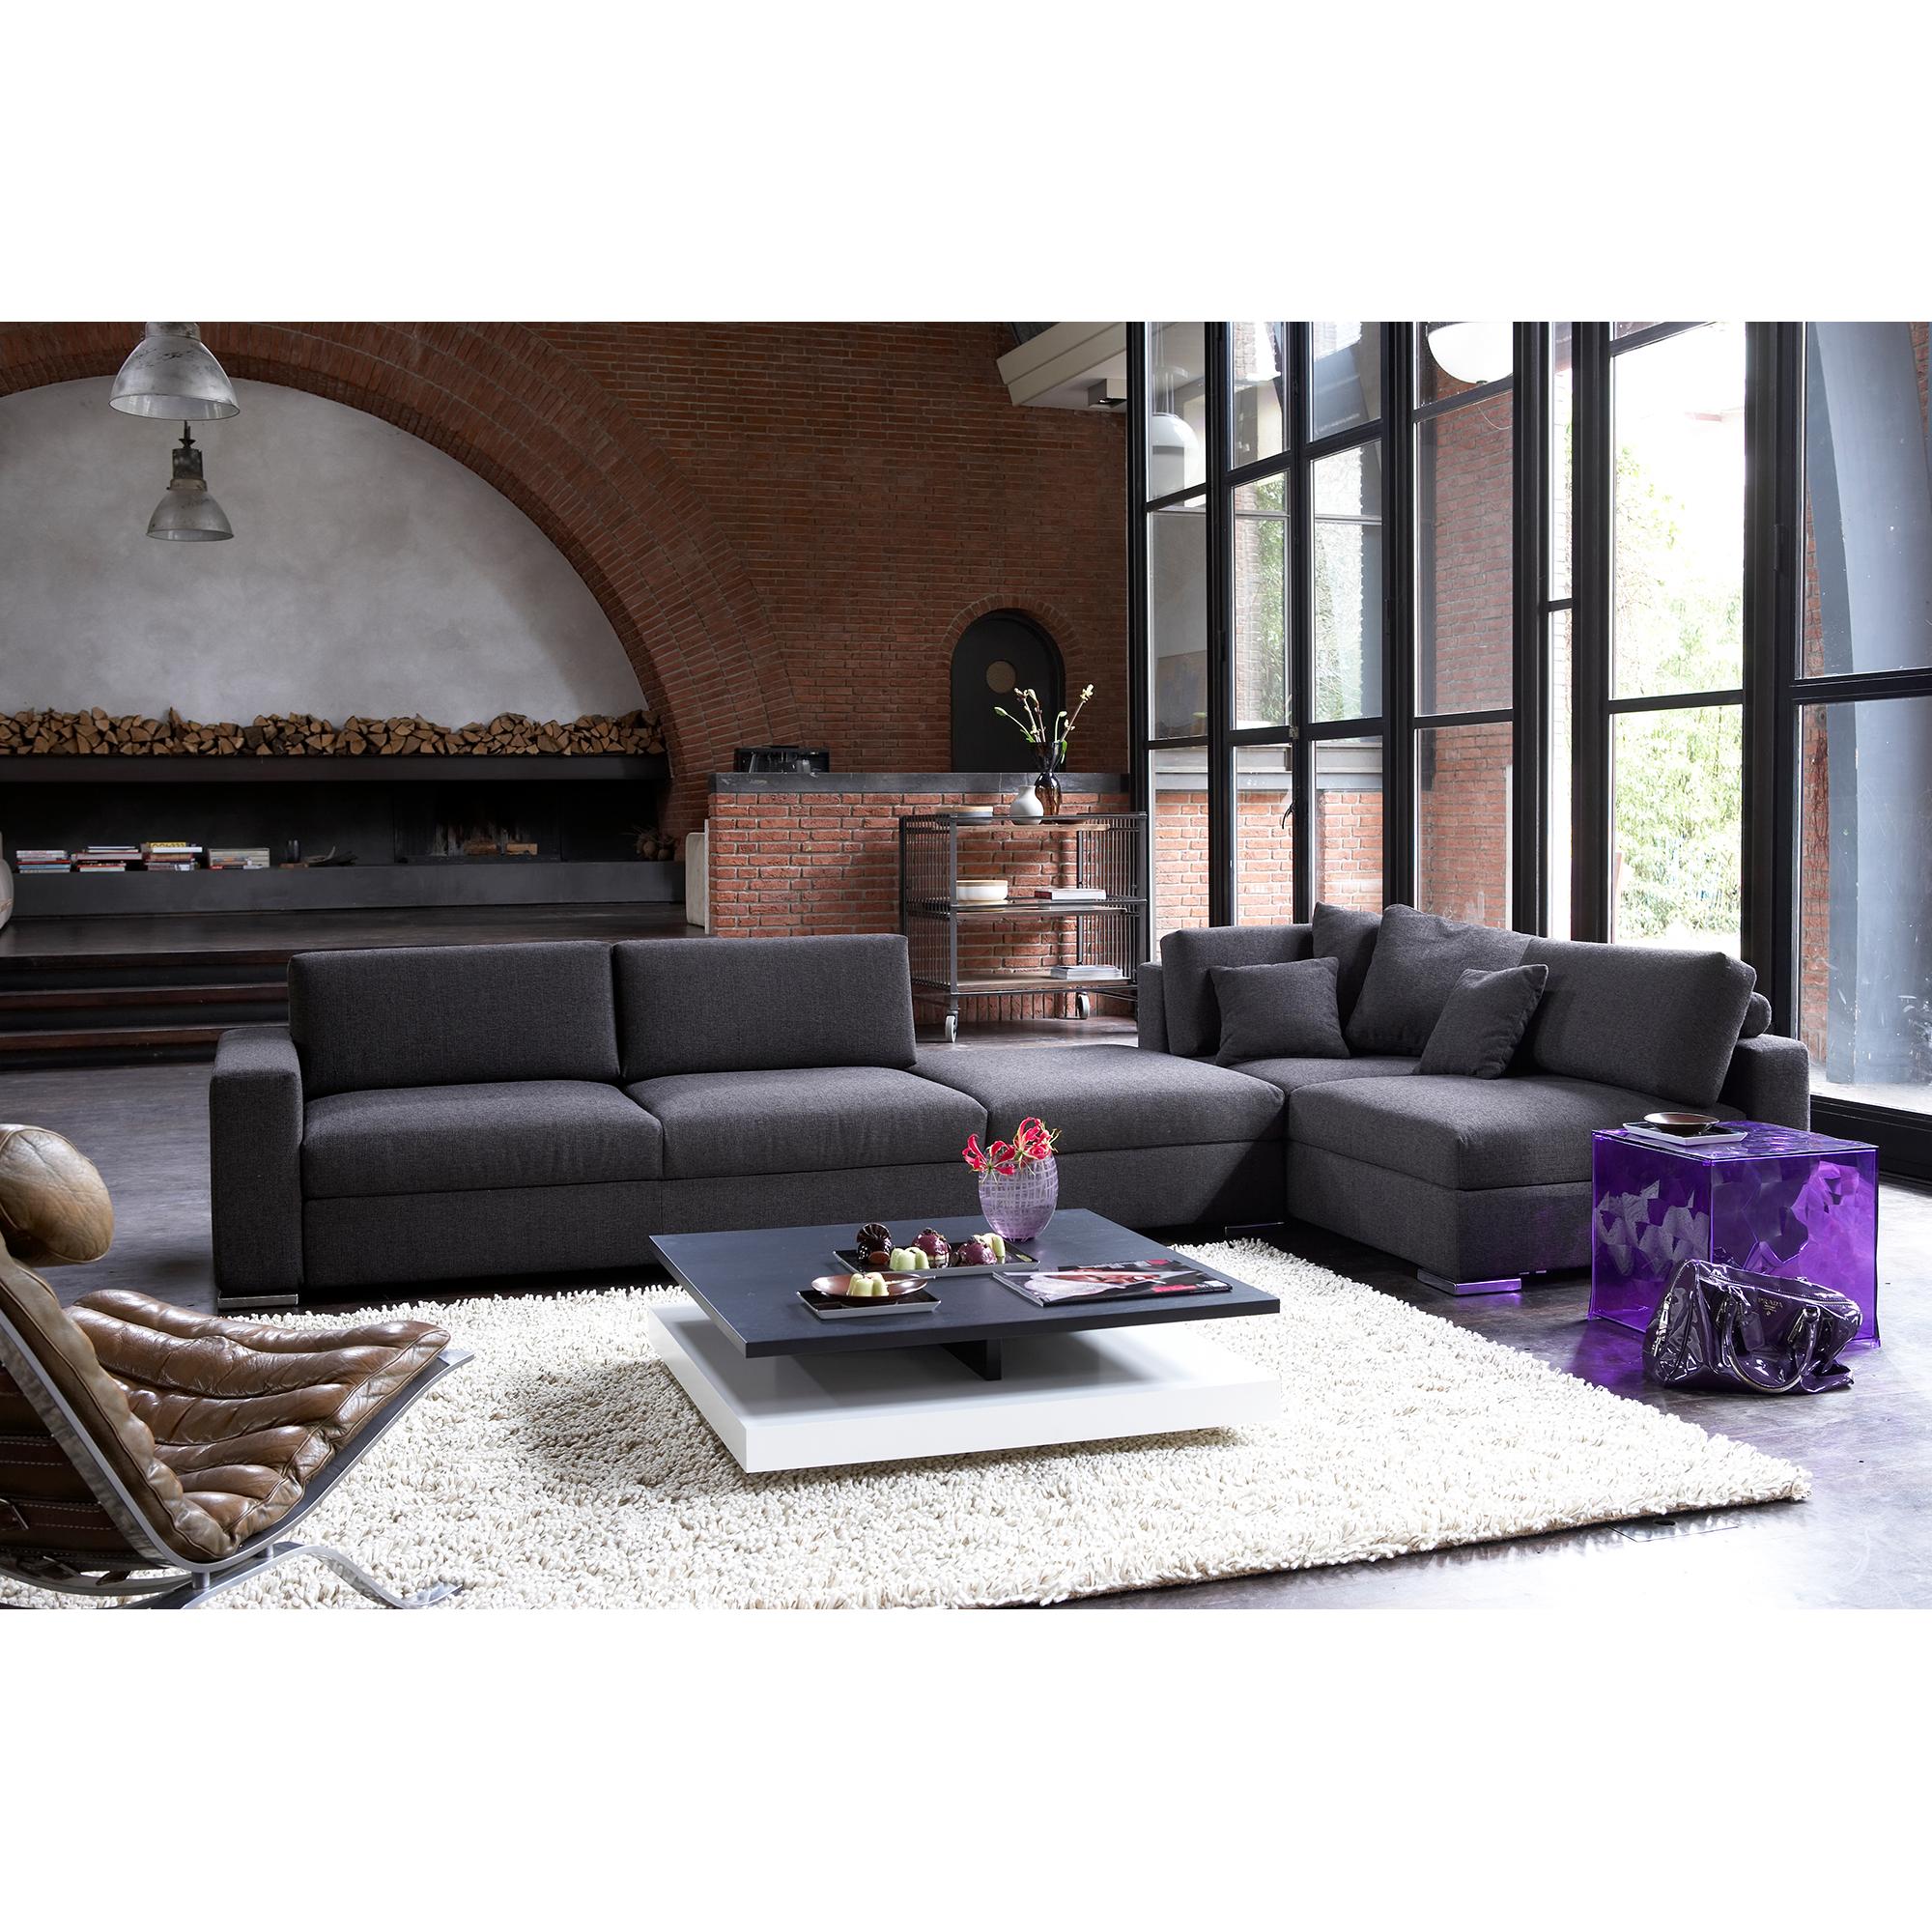 Dutch design, project, Danca design bank, design bank, ontwerp, model Modulex, comfortabele bank met chaise longue